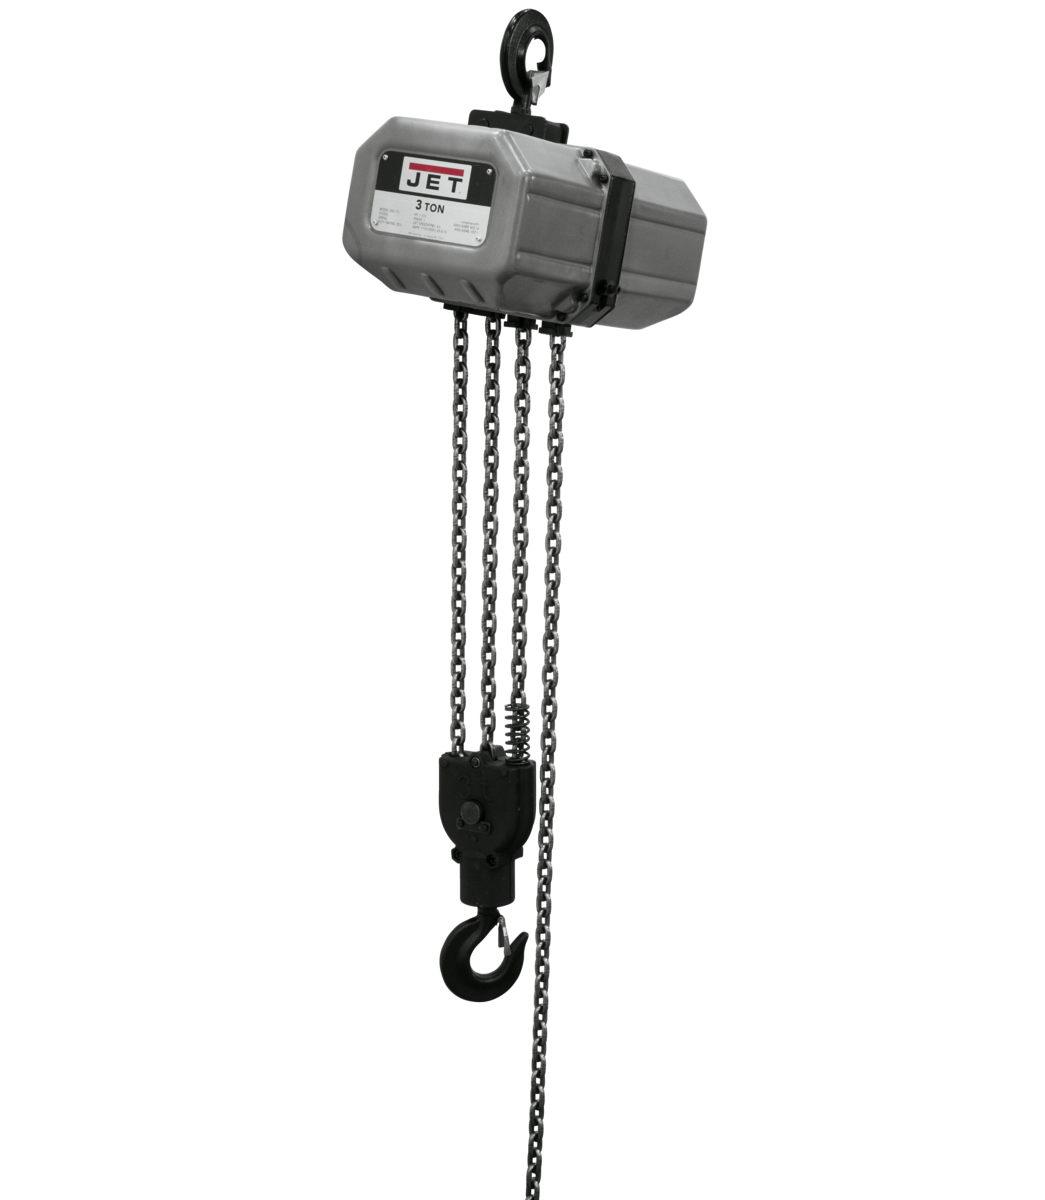 3SS-3C-10, 3-Ton Electric Chain Hoist 3-Phase 10' Lift